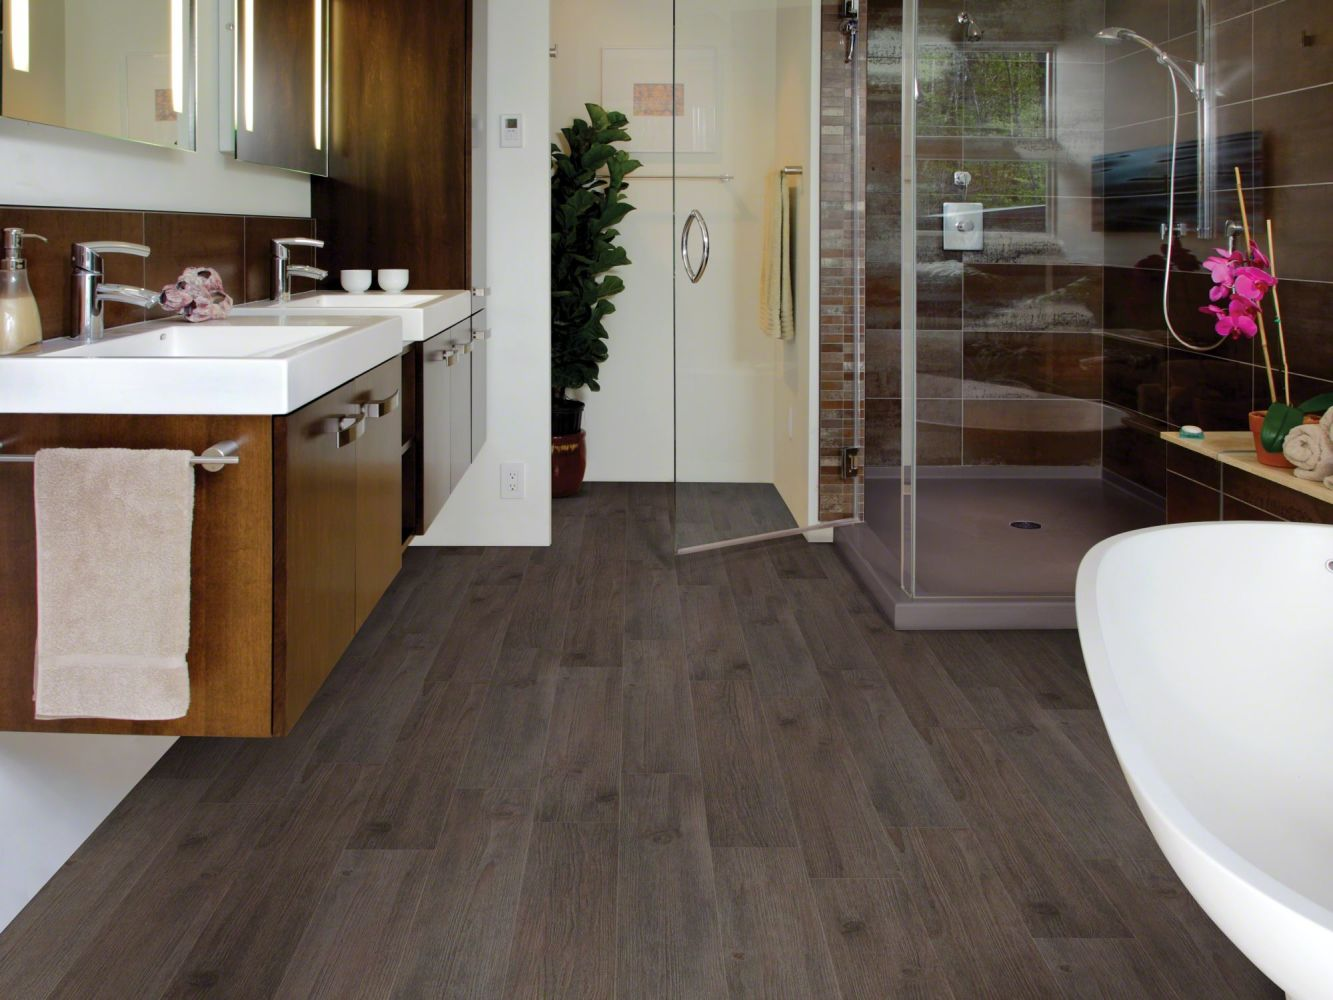 Shaw Floors Resilient Residential Urbanality 12 Plank Skyline 00759_0310V